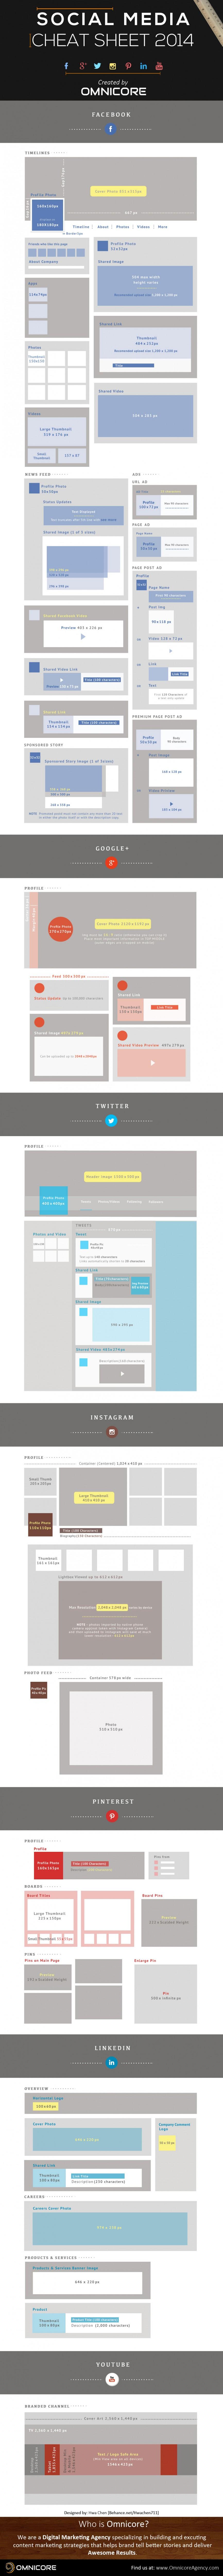 Social Media Cheat Sheet mit den wichtigsten Grafikformaten der großen Social Networks. (Grafik: Omnicore)